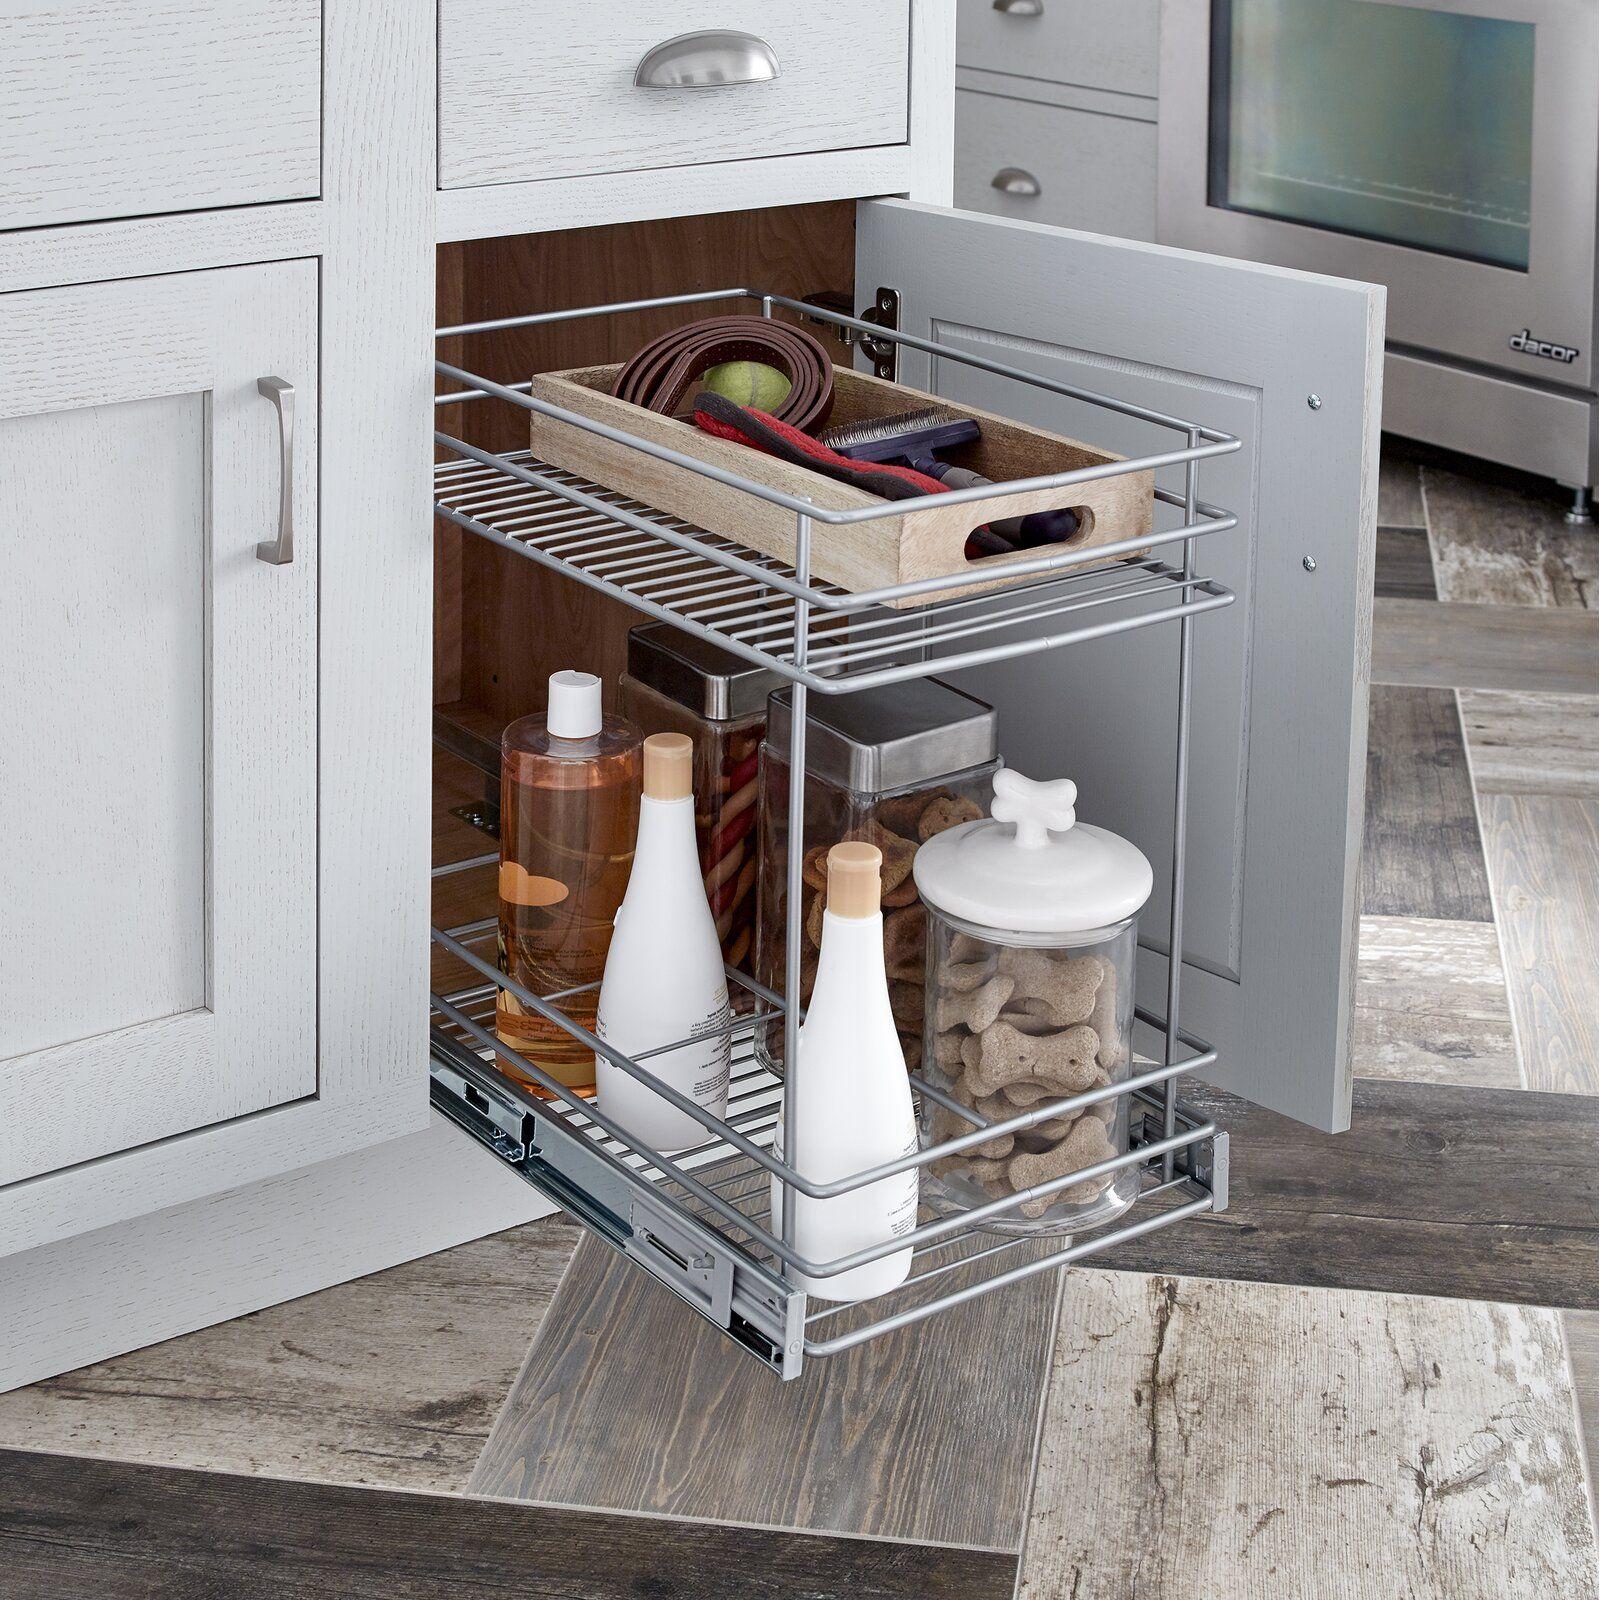 2 Tier Kitchen Cabinet Pull Out Drawer In 2021 Cabinets Organization Beautiful Kitchen Cabinets Diy Kitchen Storage